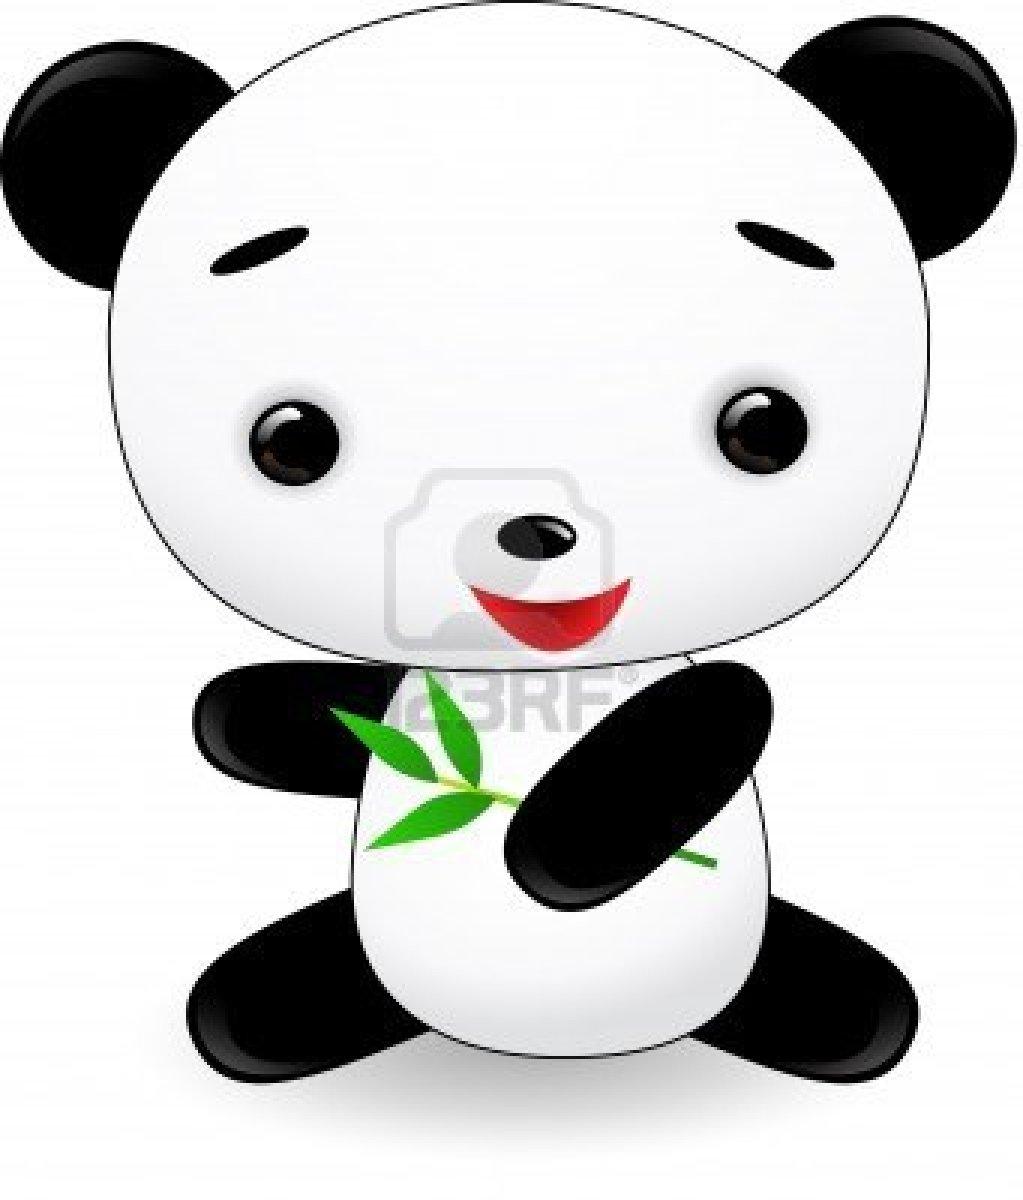 Cute Hello Kitty Face Wallpaper Dessins En Couleurs 224 Imprimer Panda Num 233 Ro 108836